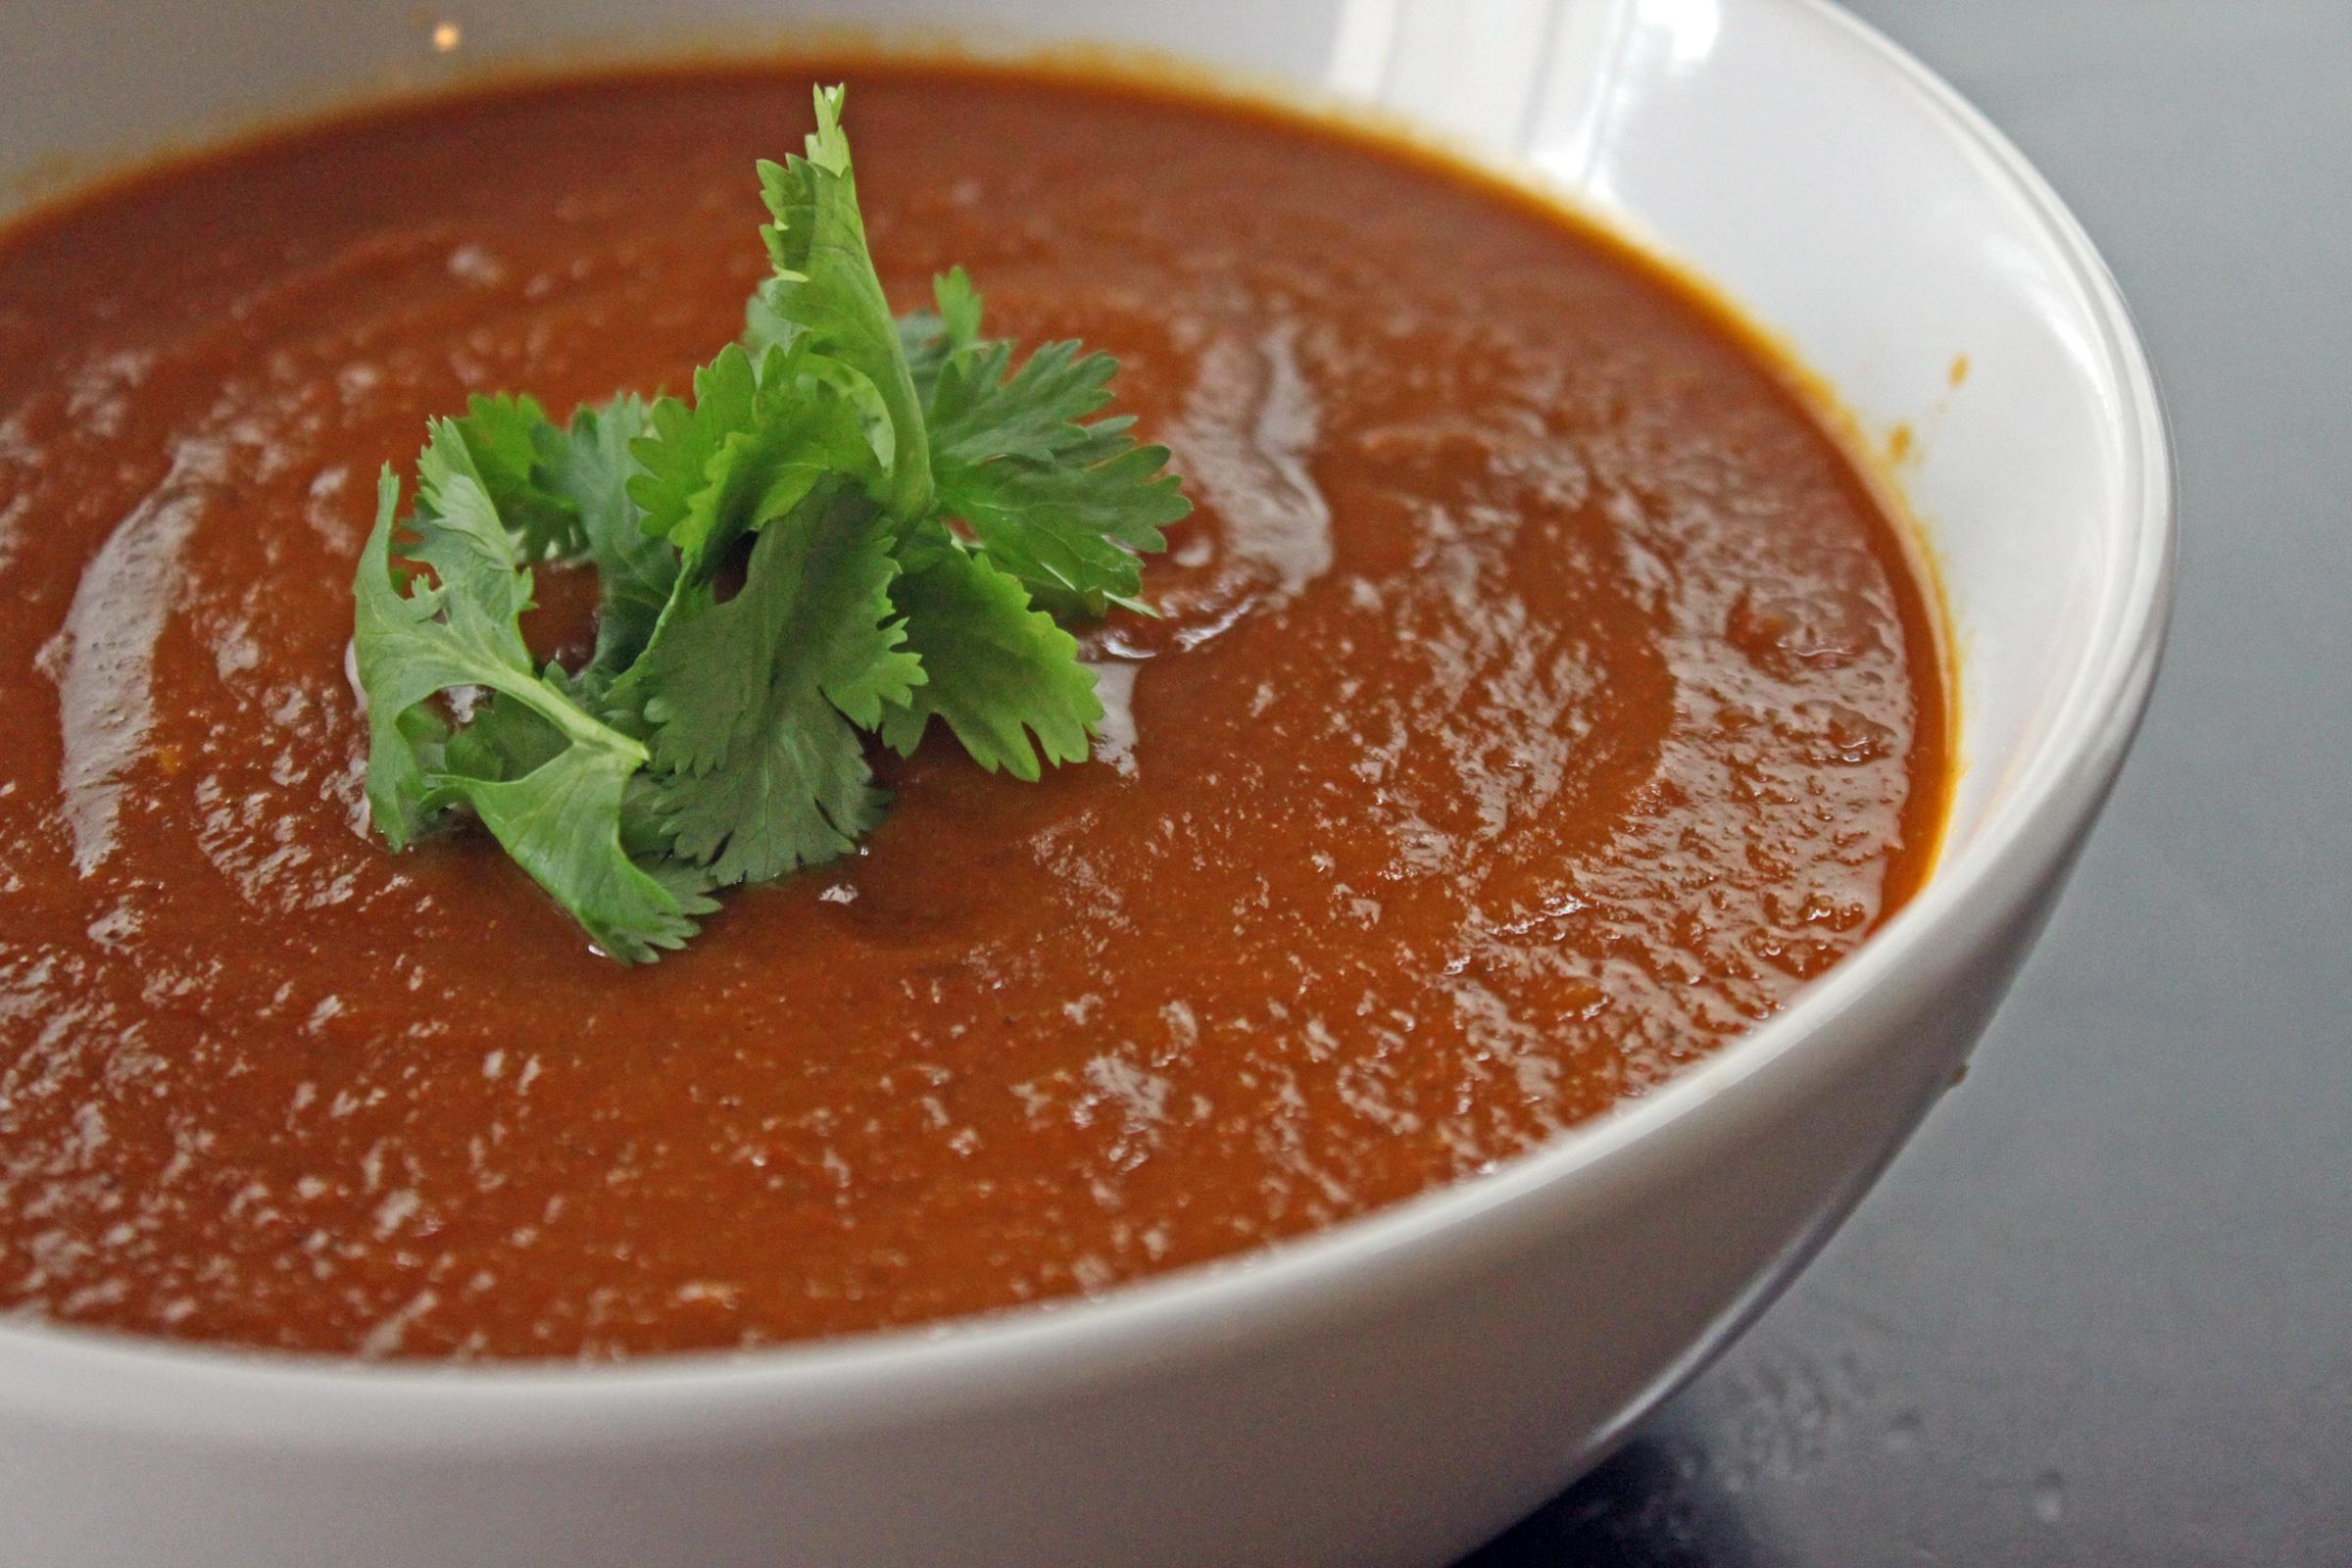 20131014_Eggplant_soup11